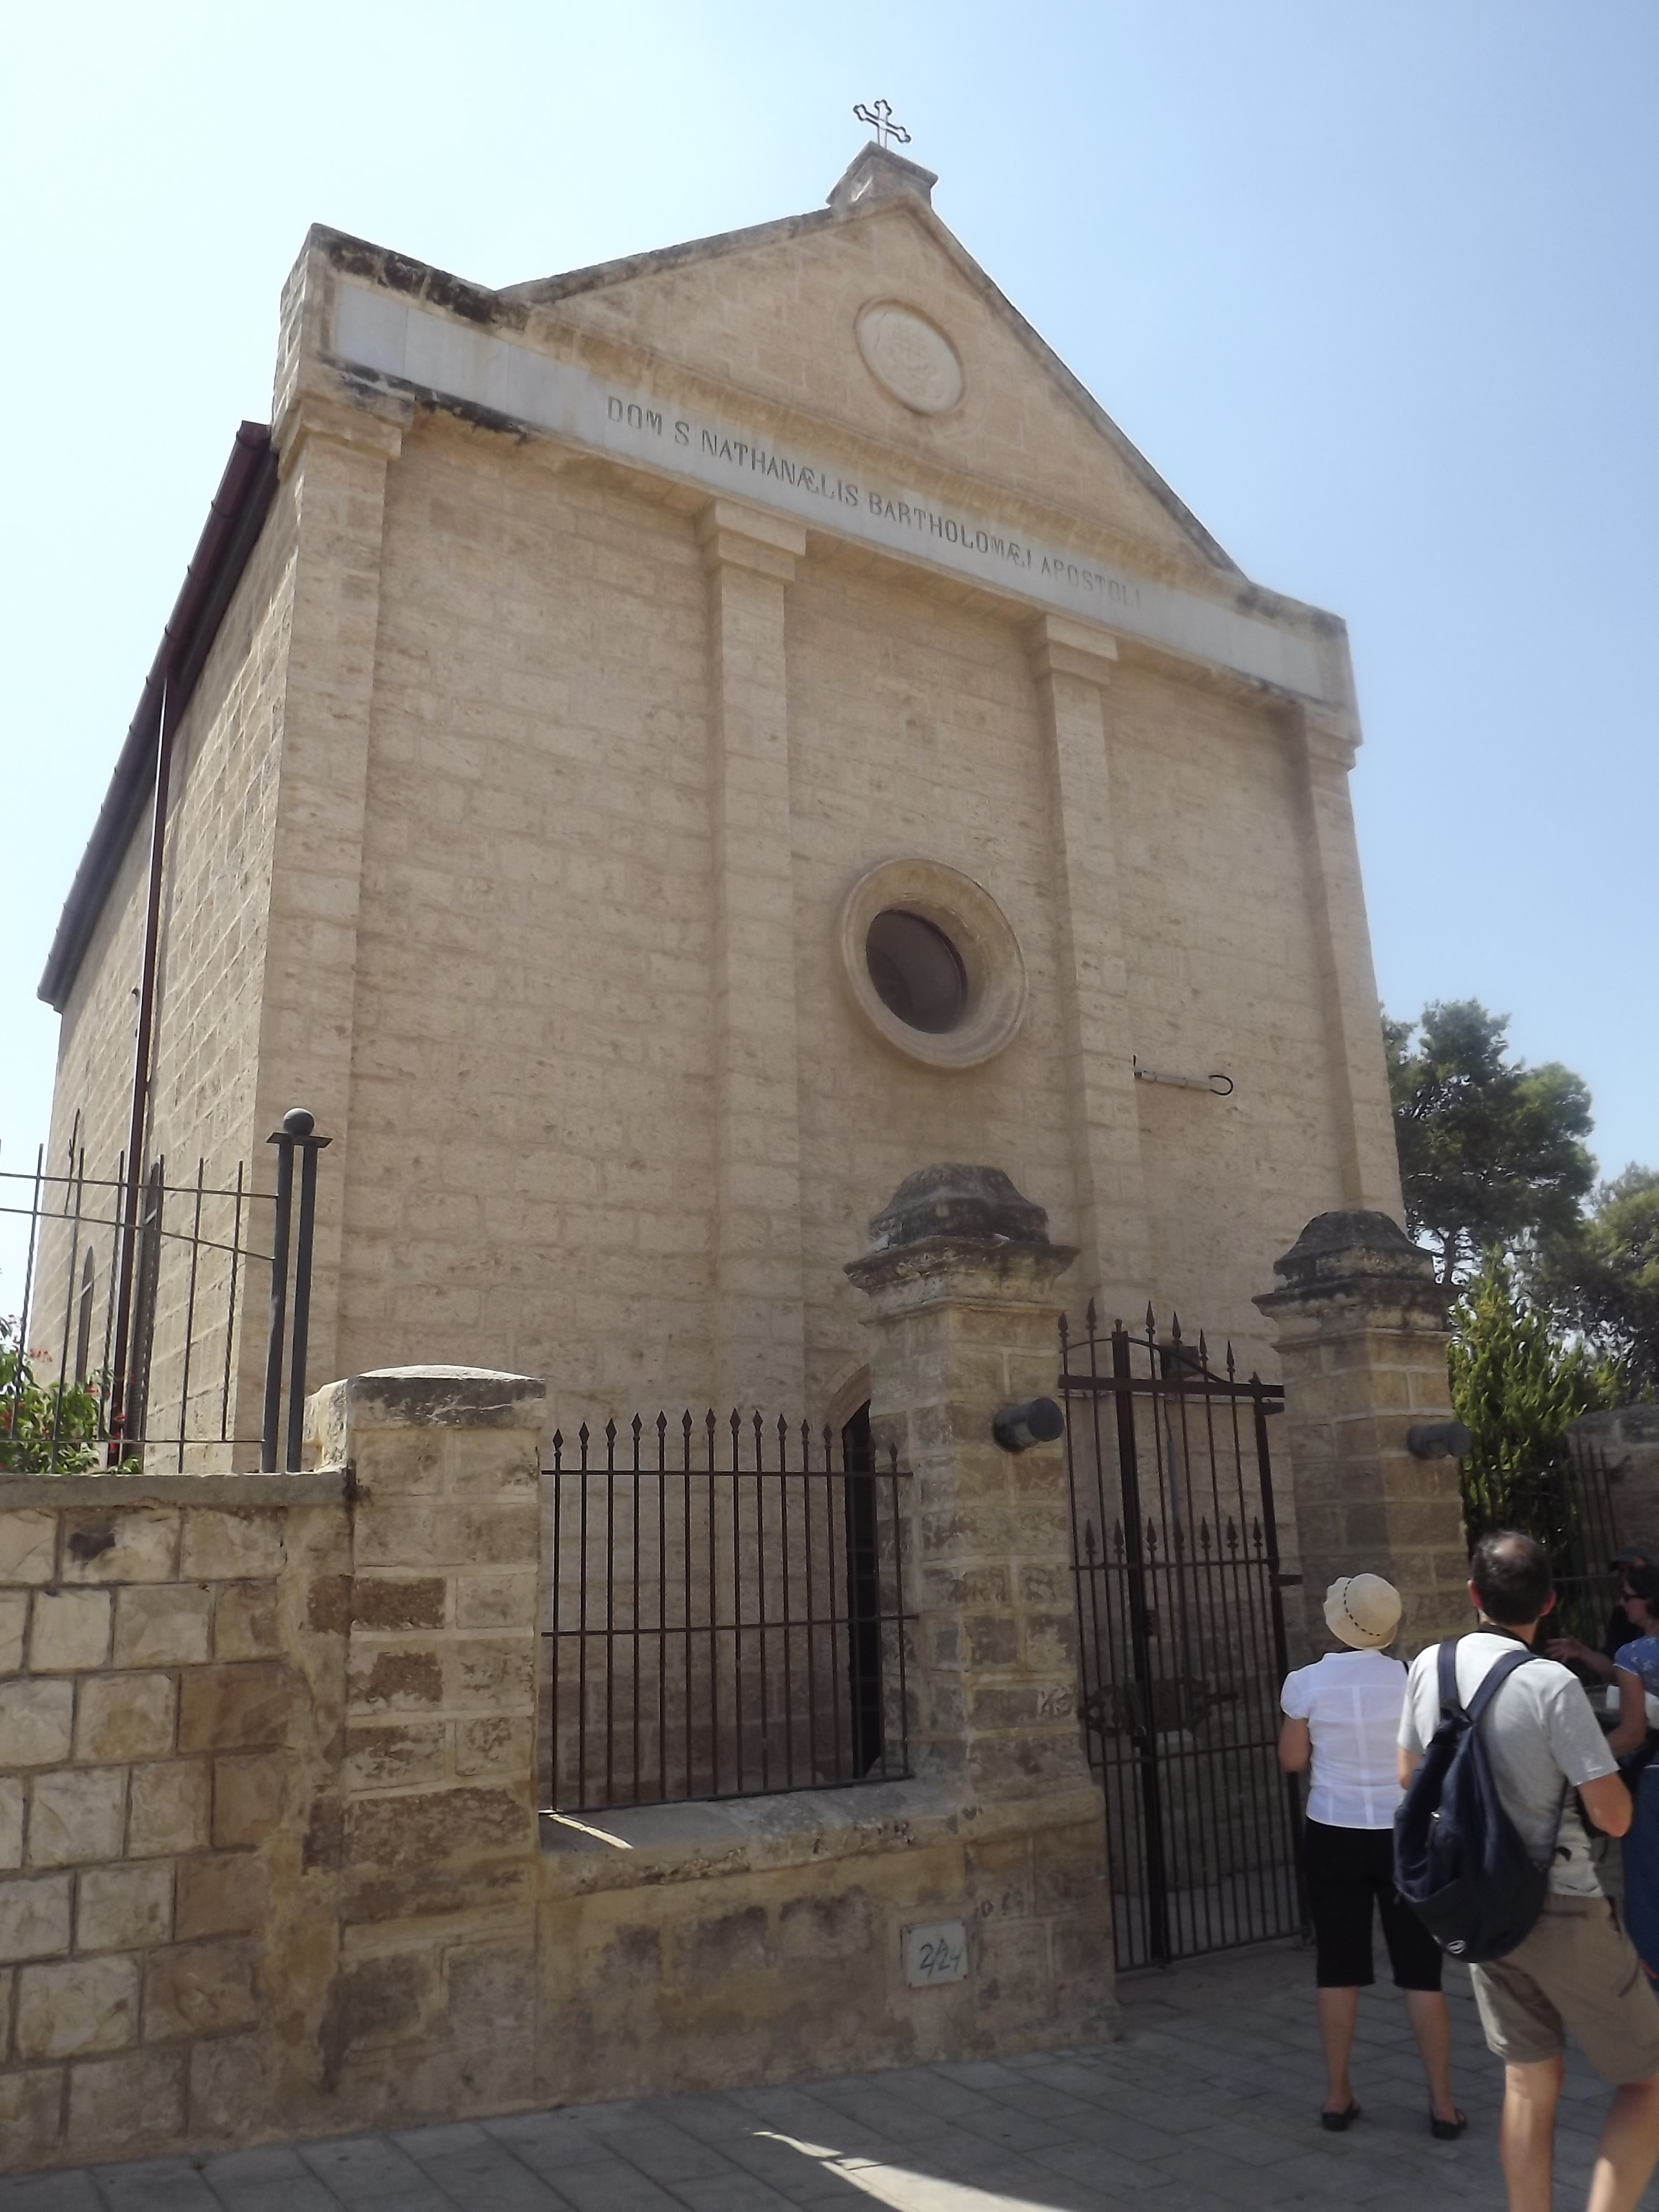 cana-chiesa-natanaele-2_0